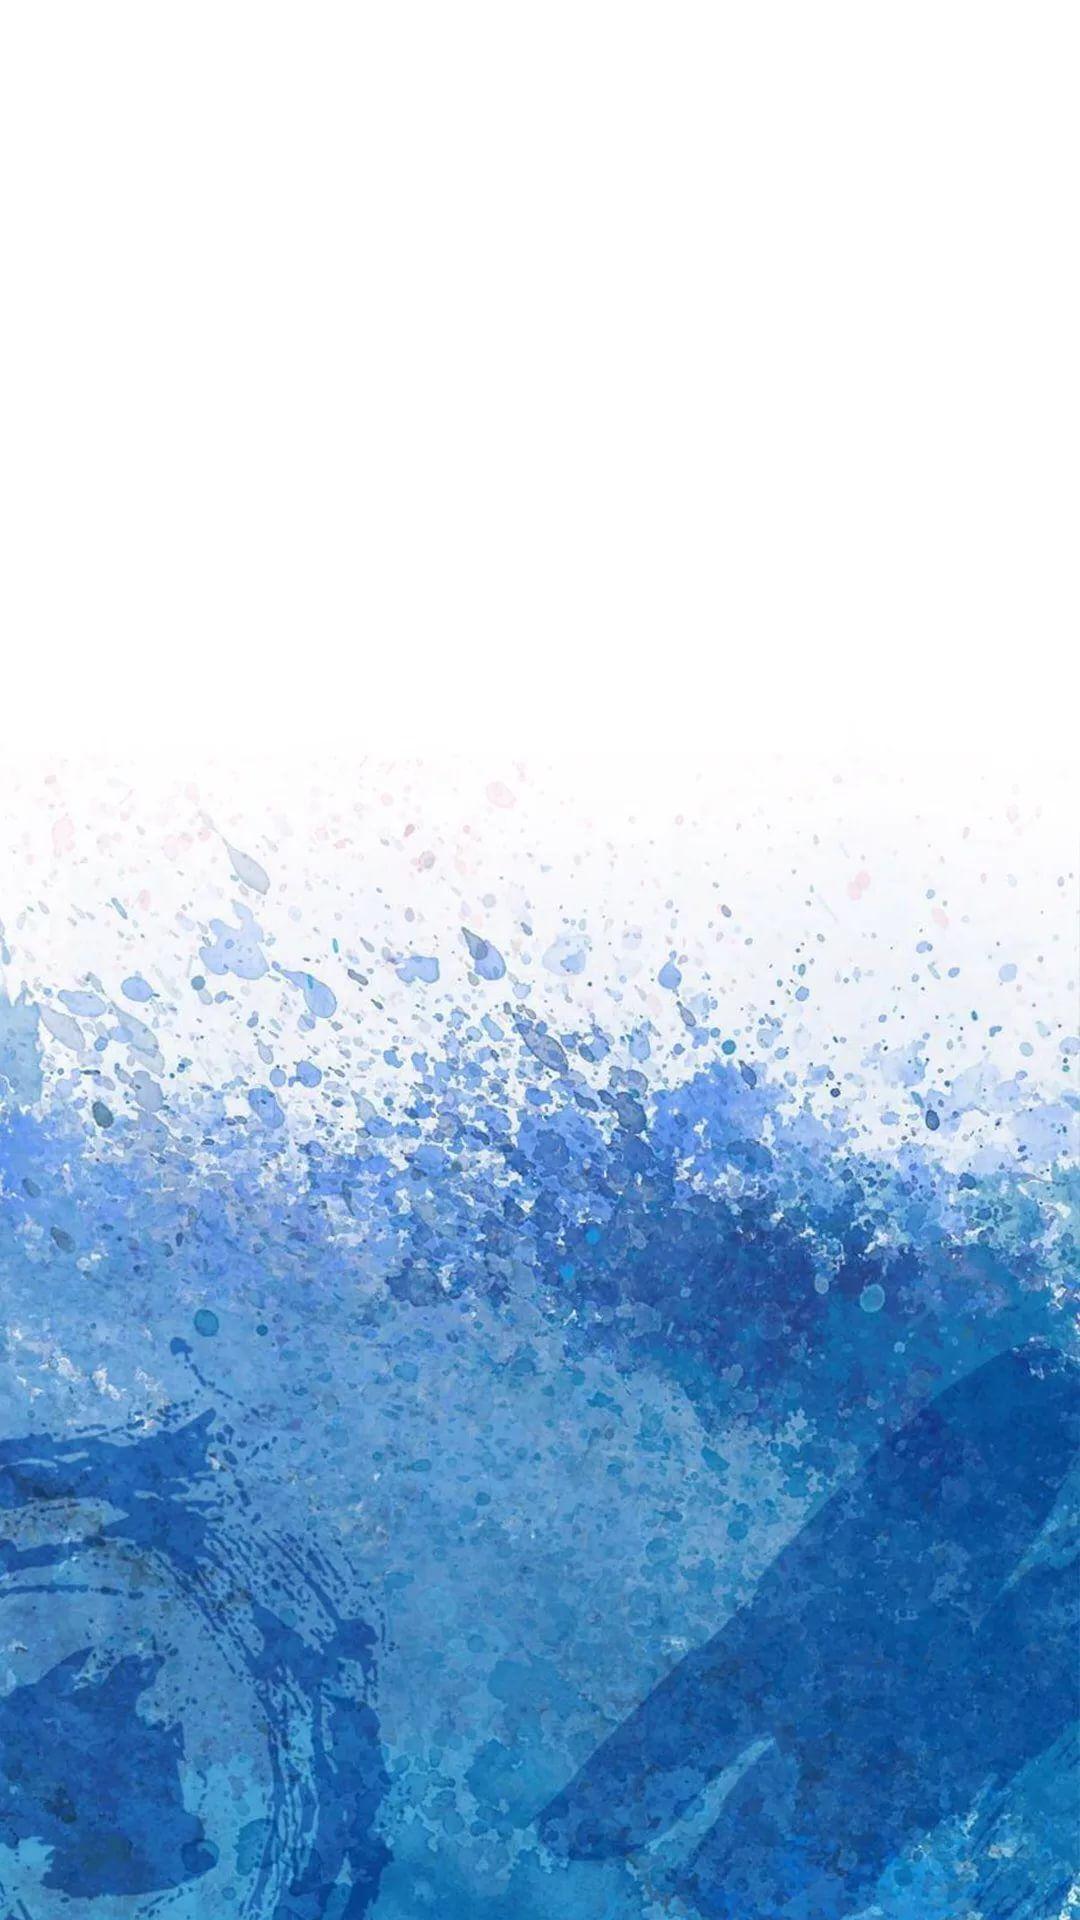 Watercolor hd wallpaper